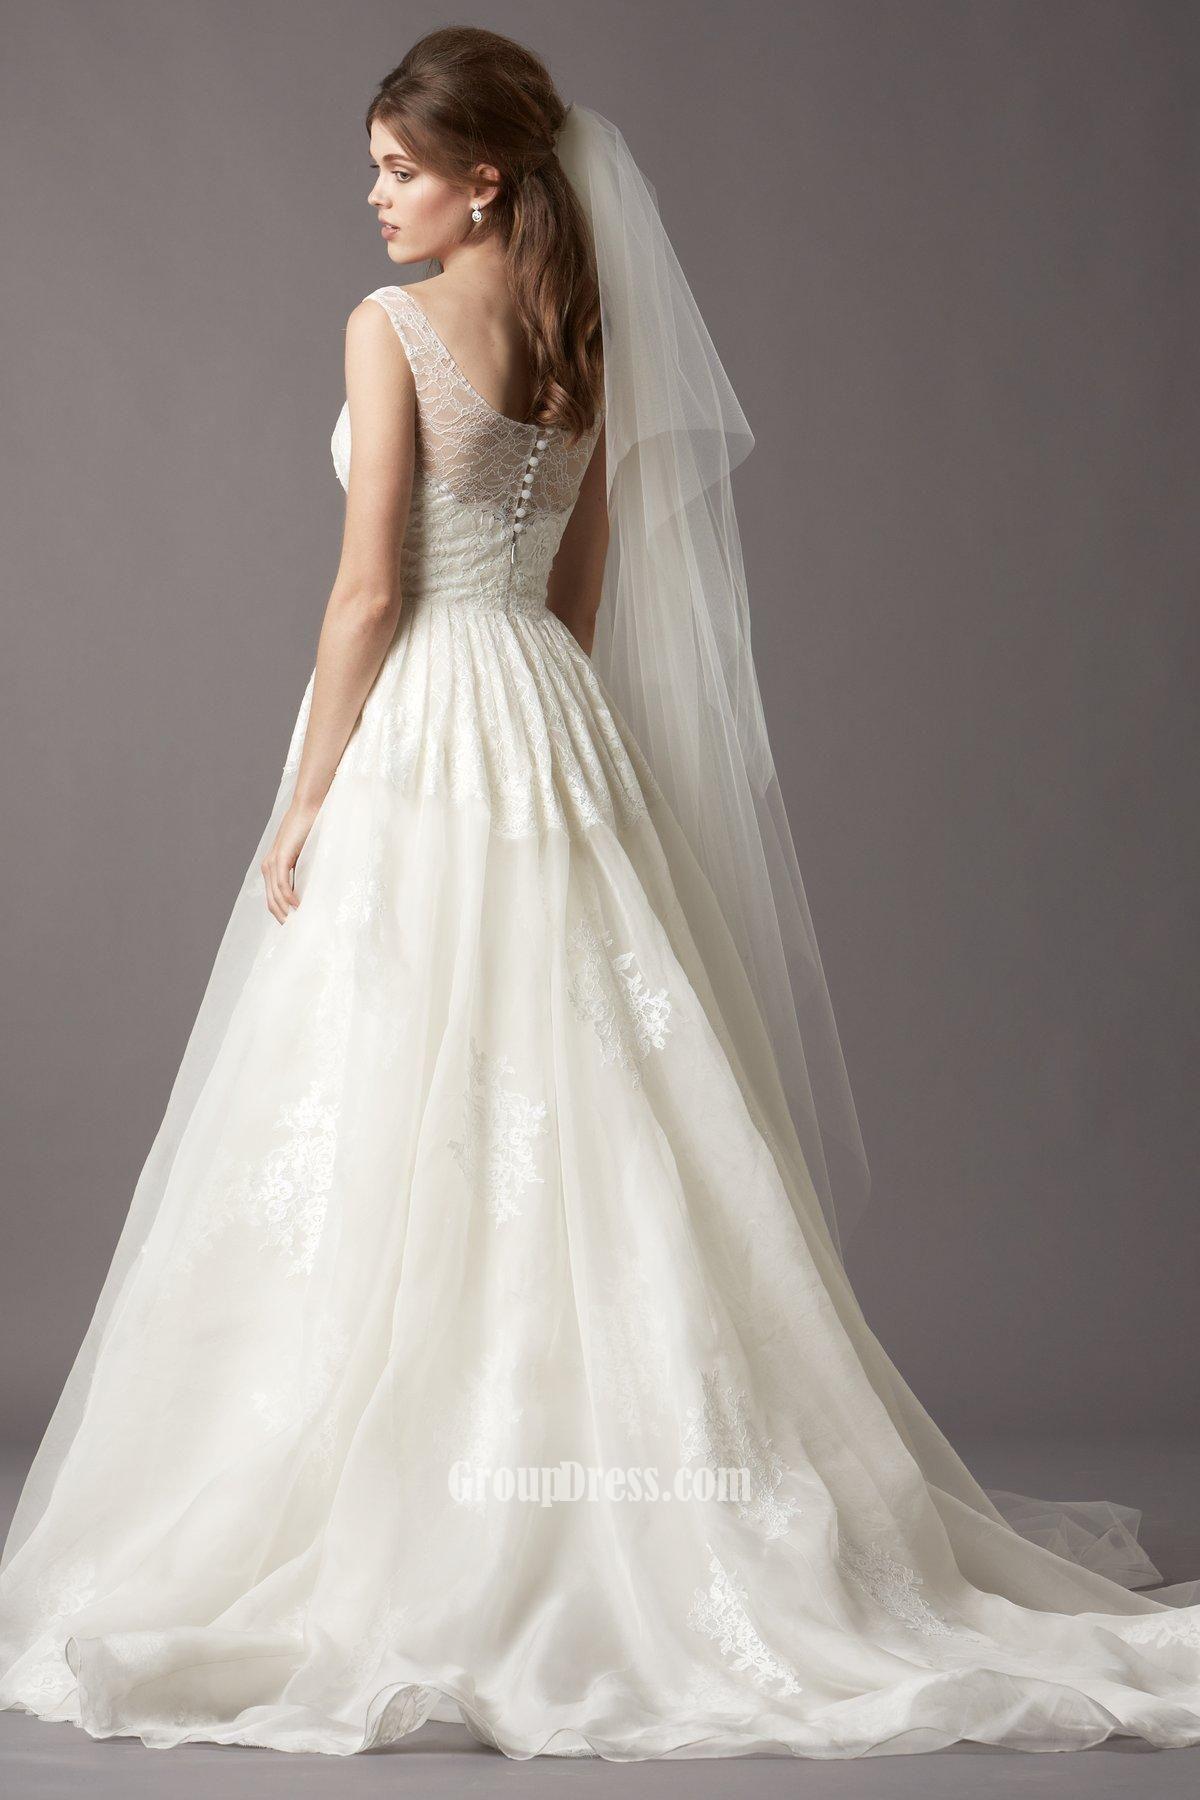 lace boatneck wedding dress | Sleeveless Boat Neck Organza and Lace ...